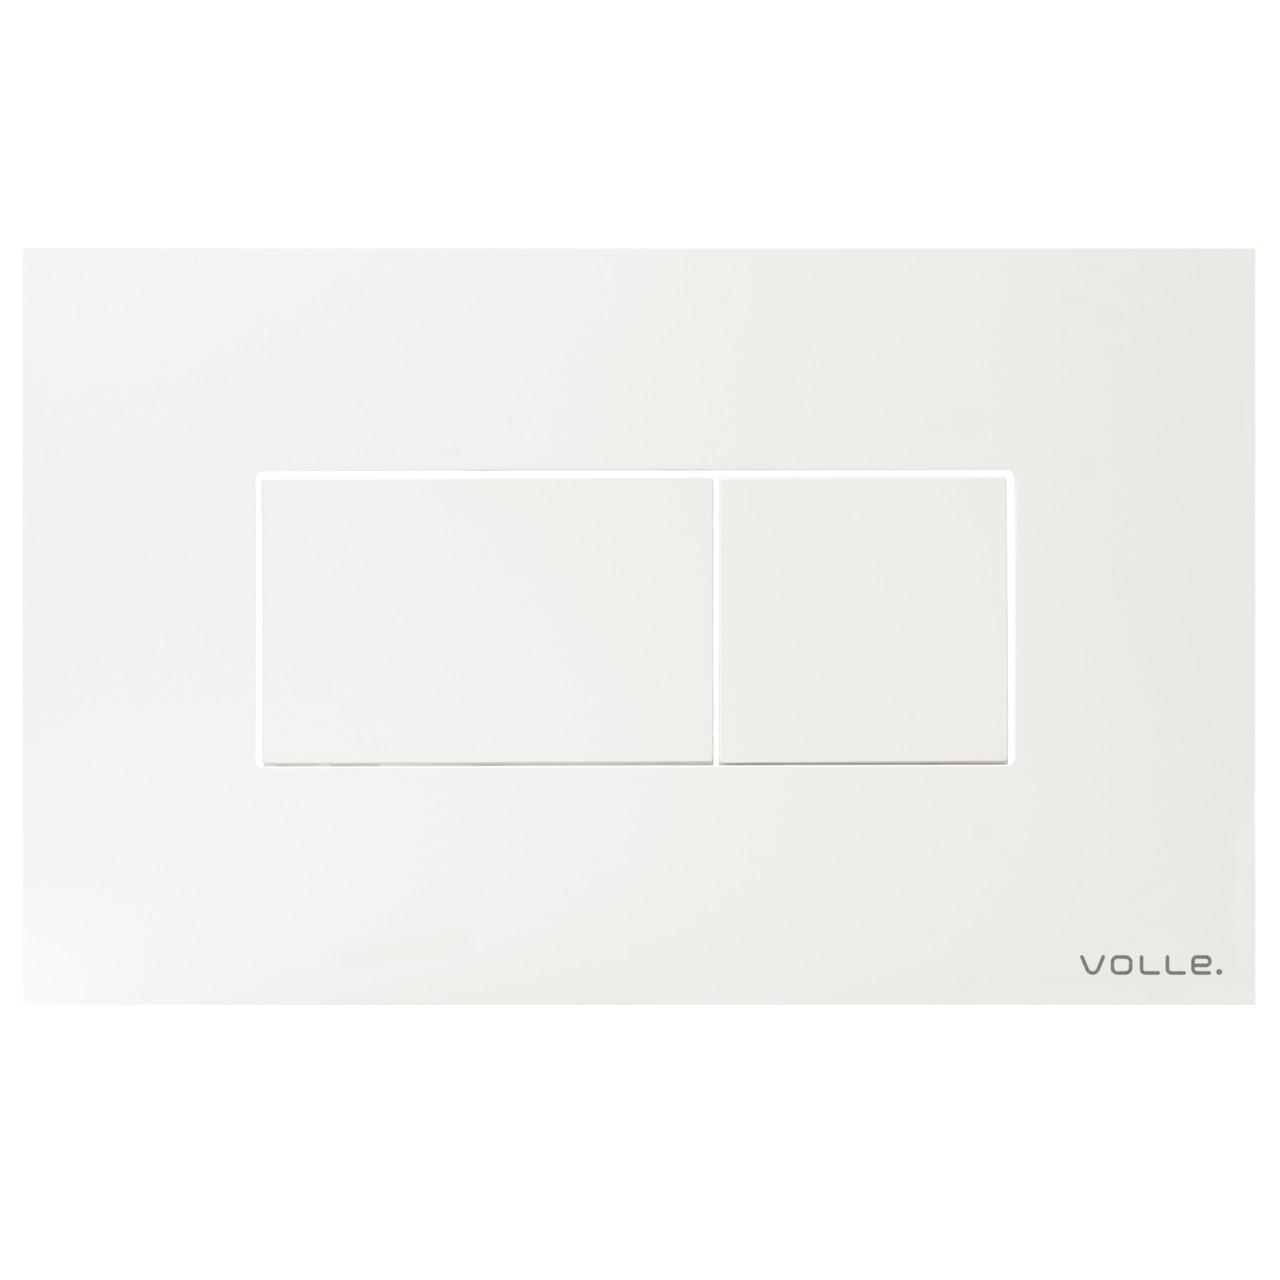 Змивна клавіша VOLLE ALTO NEO біла, пластик